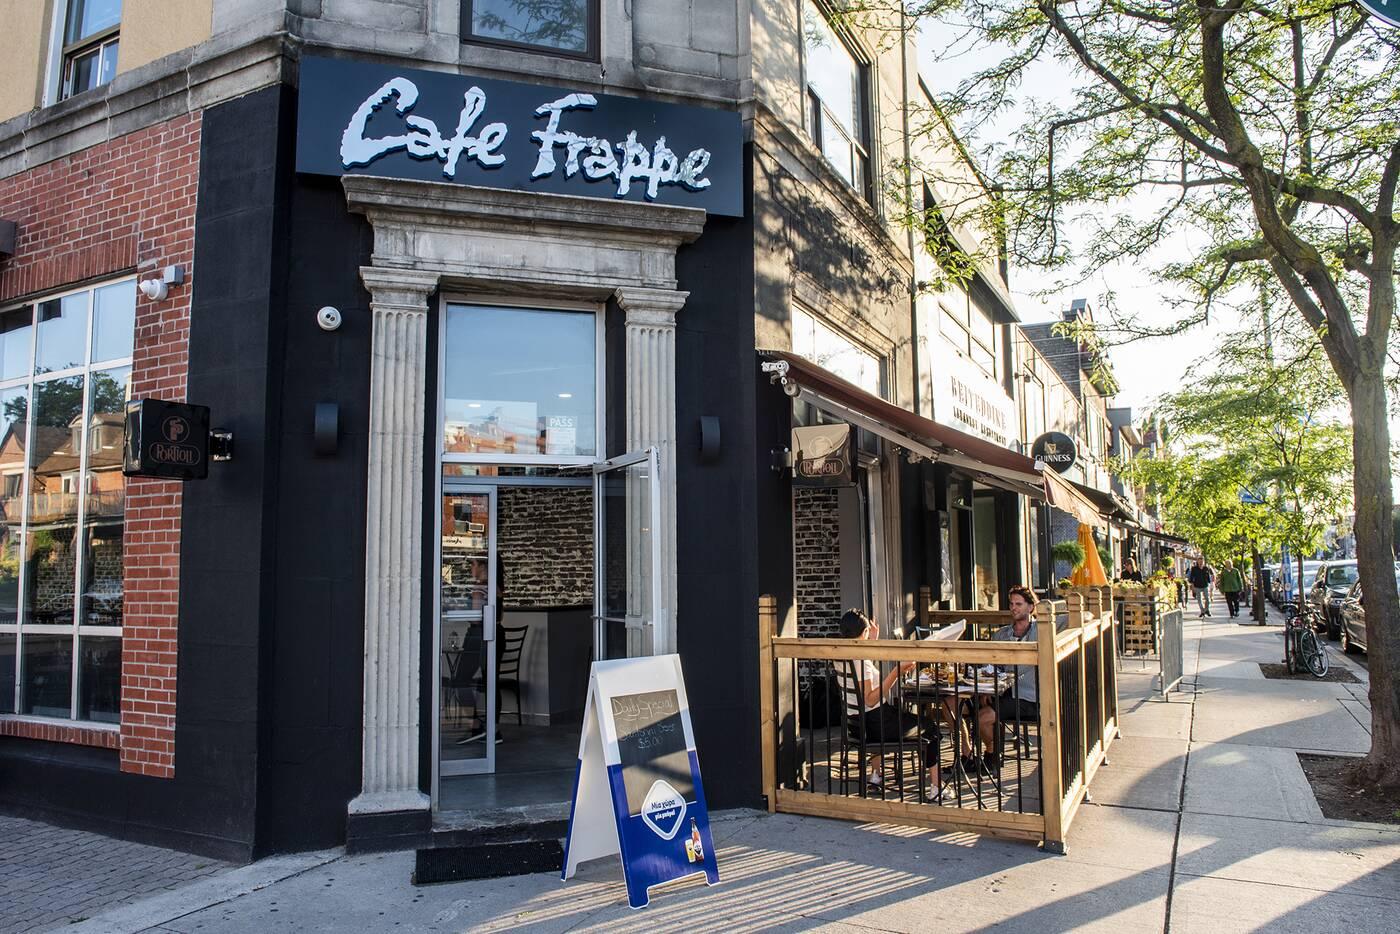 cafe frappe toronto